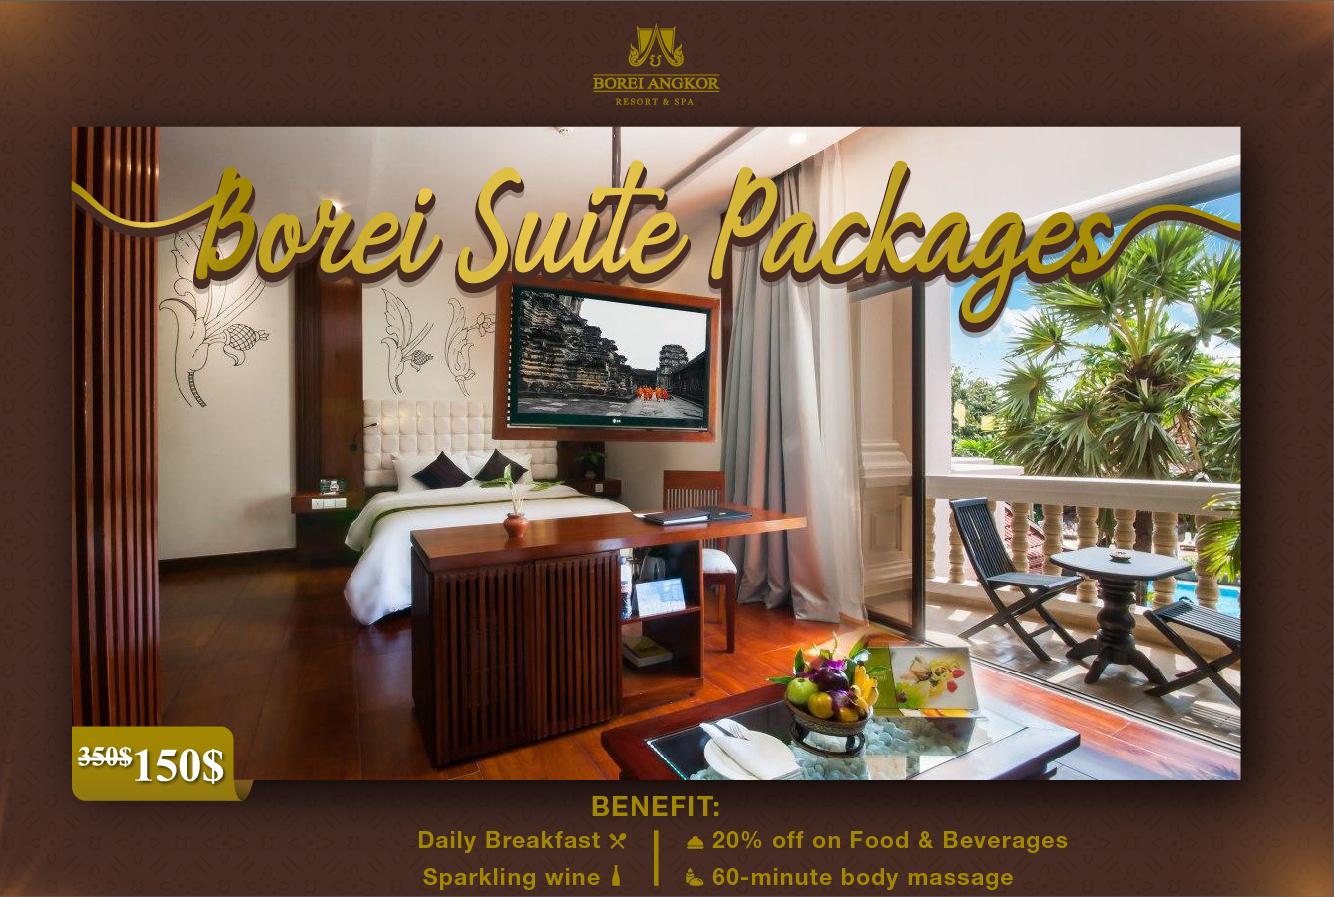 Borei Suite Package